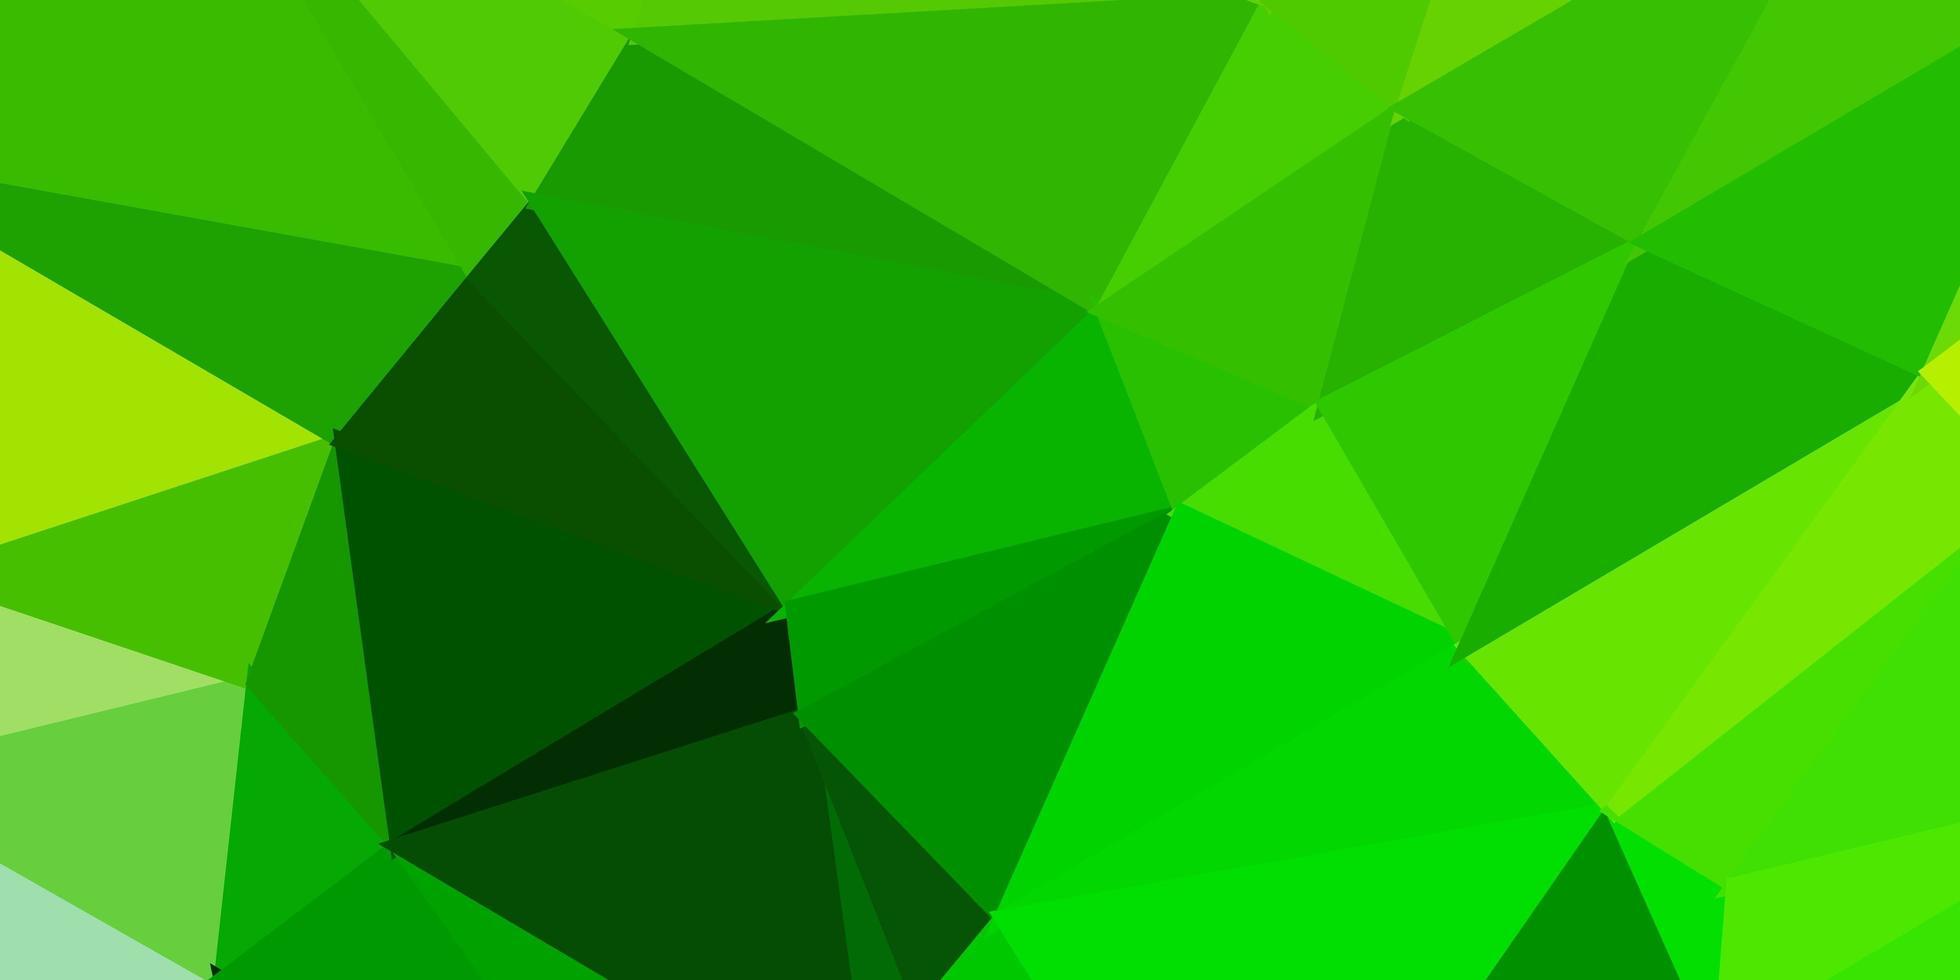 hellgrünes, gelbes Vektorgradienten-Polygonlayout. vektor